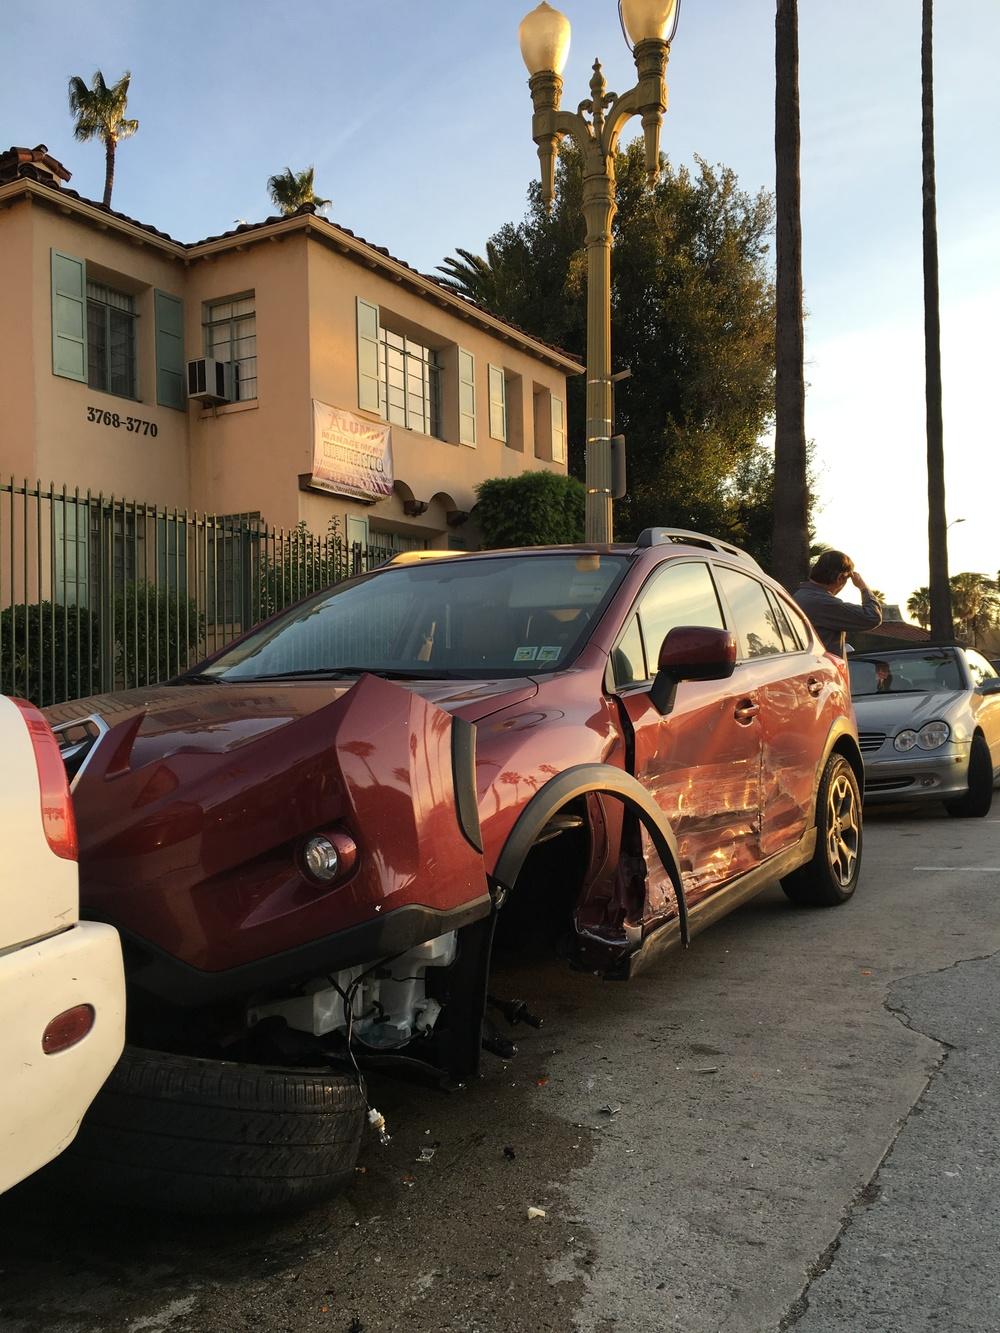 Totaled Subaru Crosstrek